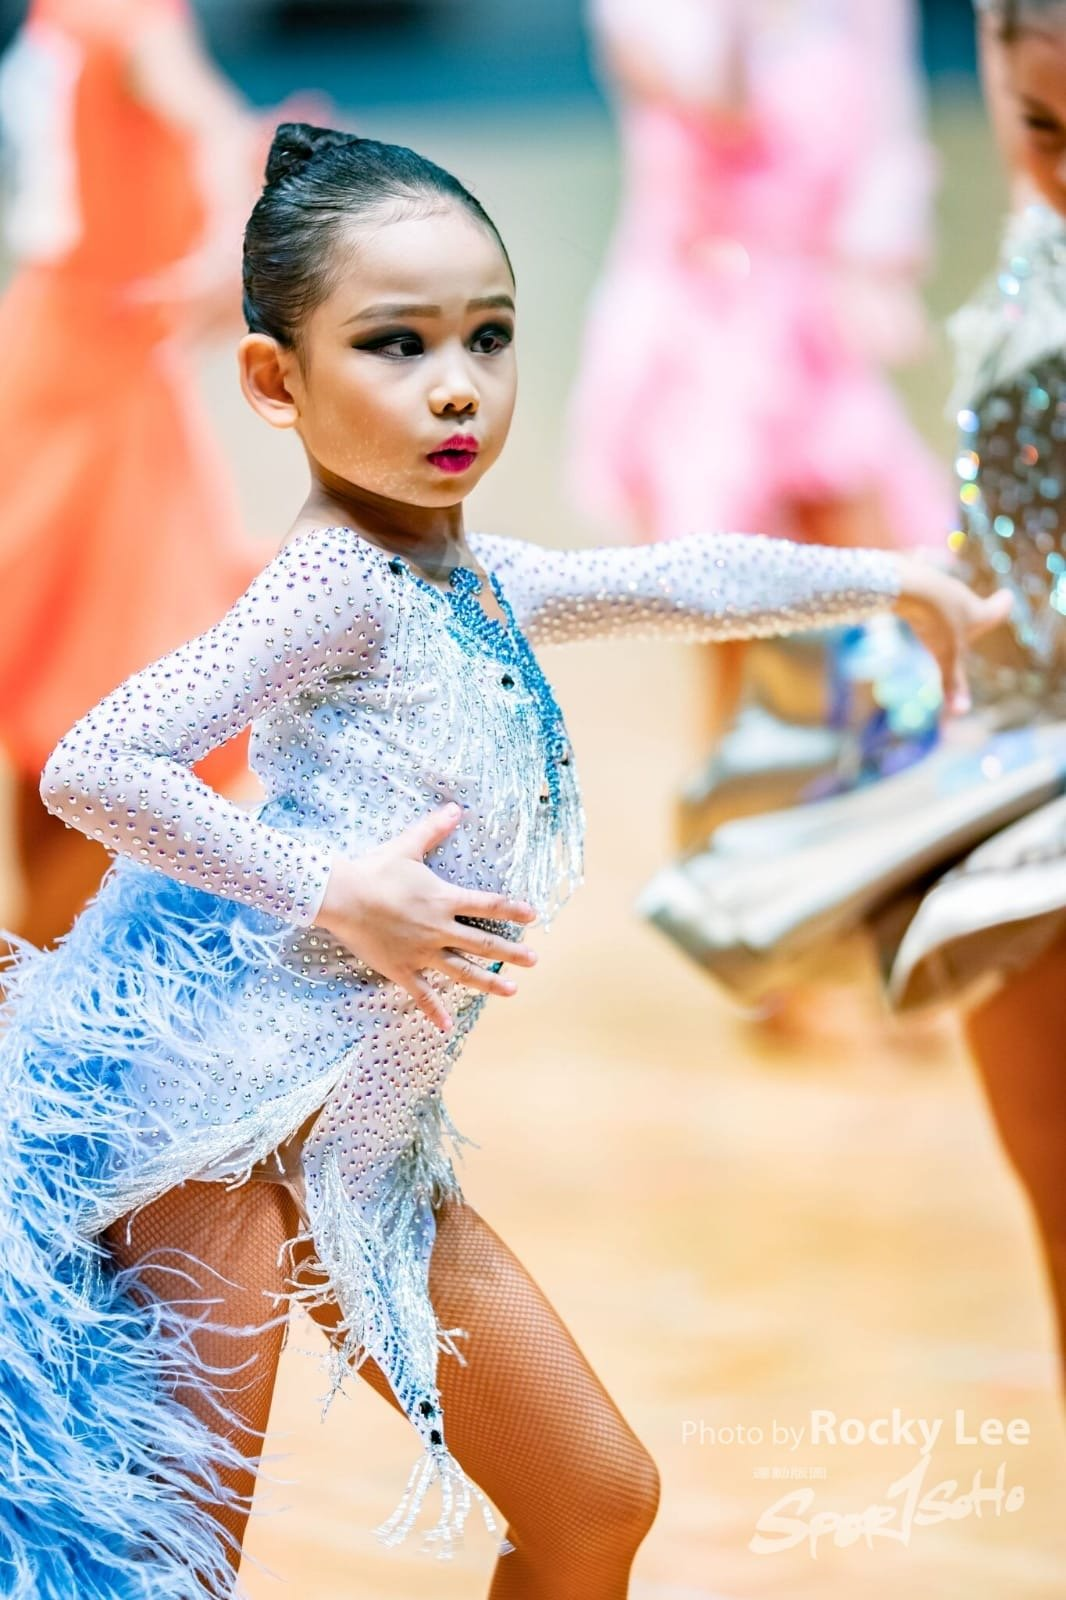 Joyce提到,家長們對拉丁舞音樂存在誤解,總覺得小朋友需要學習某個特定的歌曲,小朋友才學懂舞步,其實只要掌握節奏,所有的拉丁歌曲都可以隨之起舞,並不需要特定的曲目。(受訪者提供)